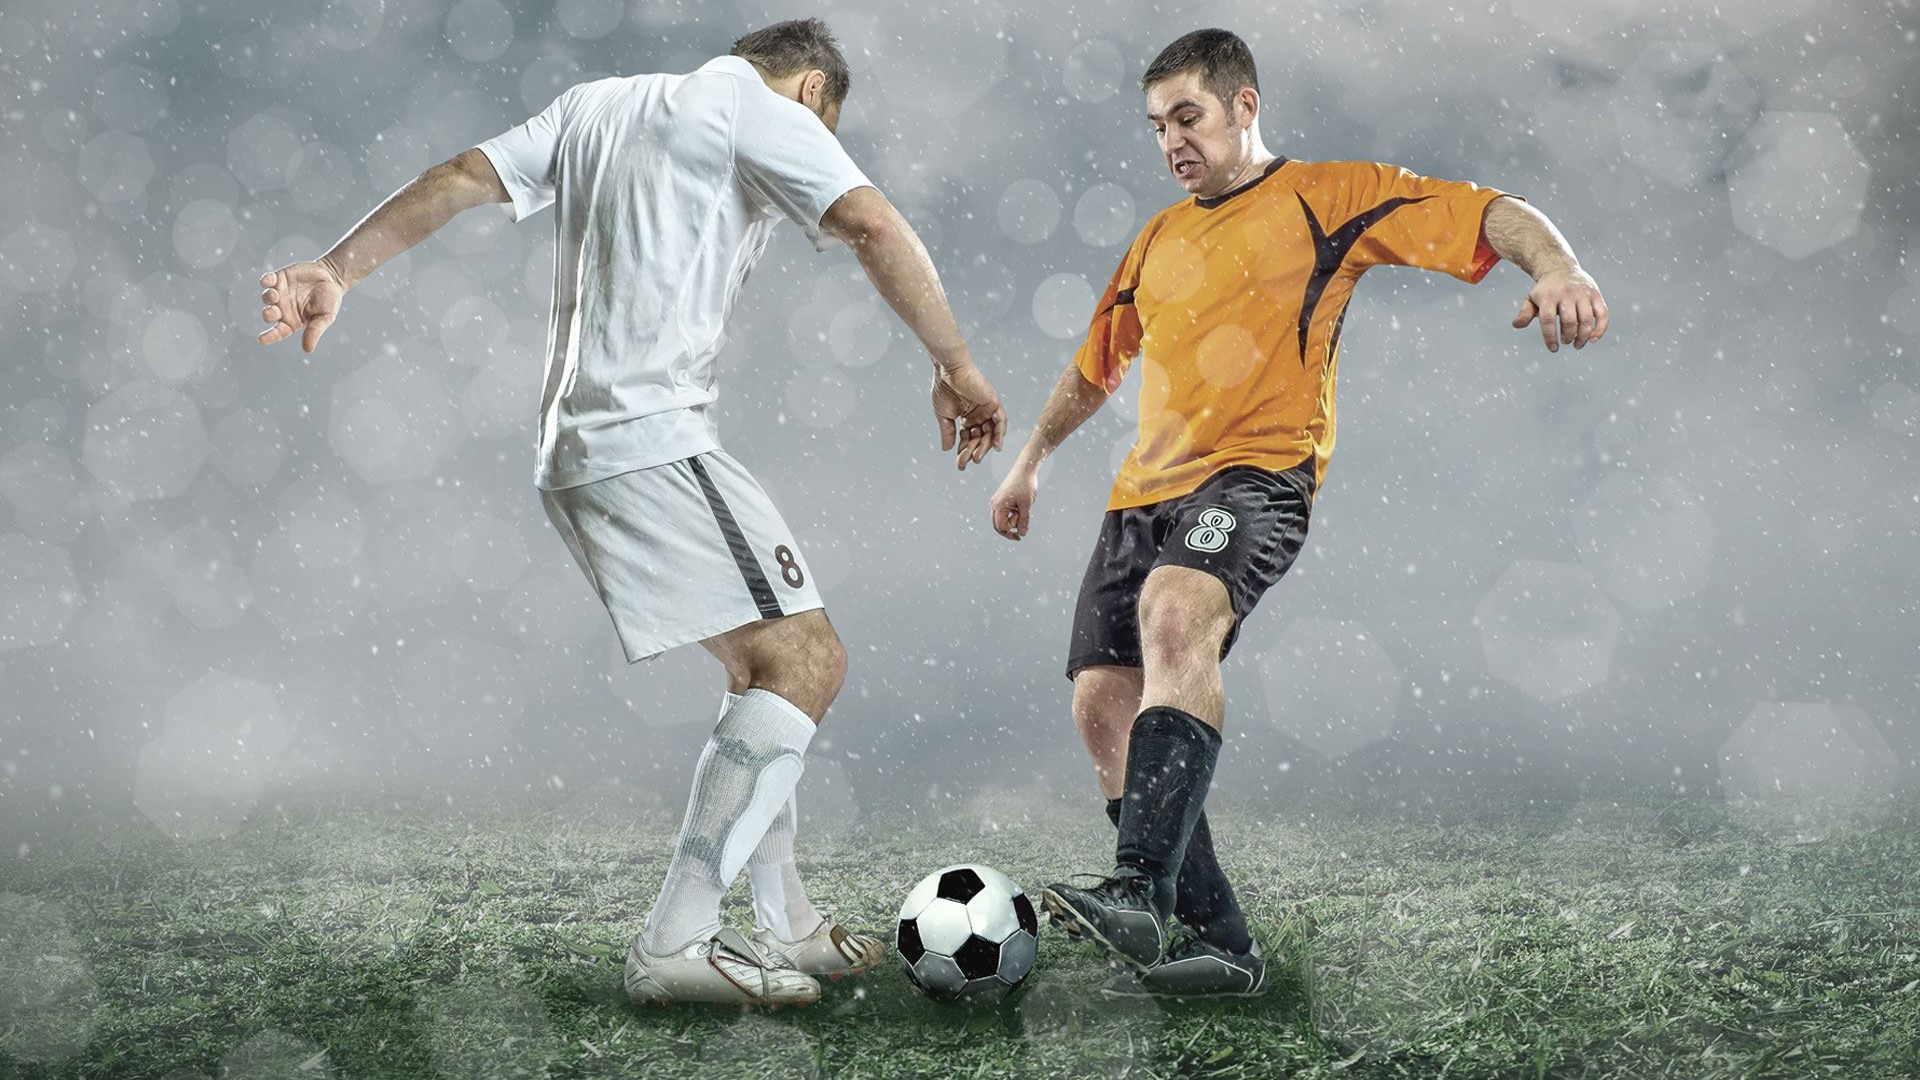 ospreys-vs-scarlets-rugby-live